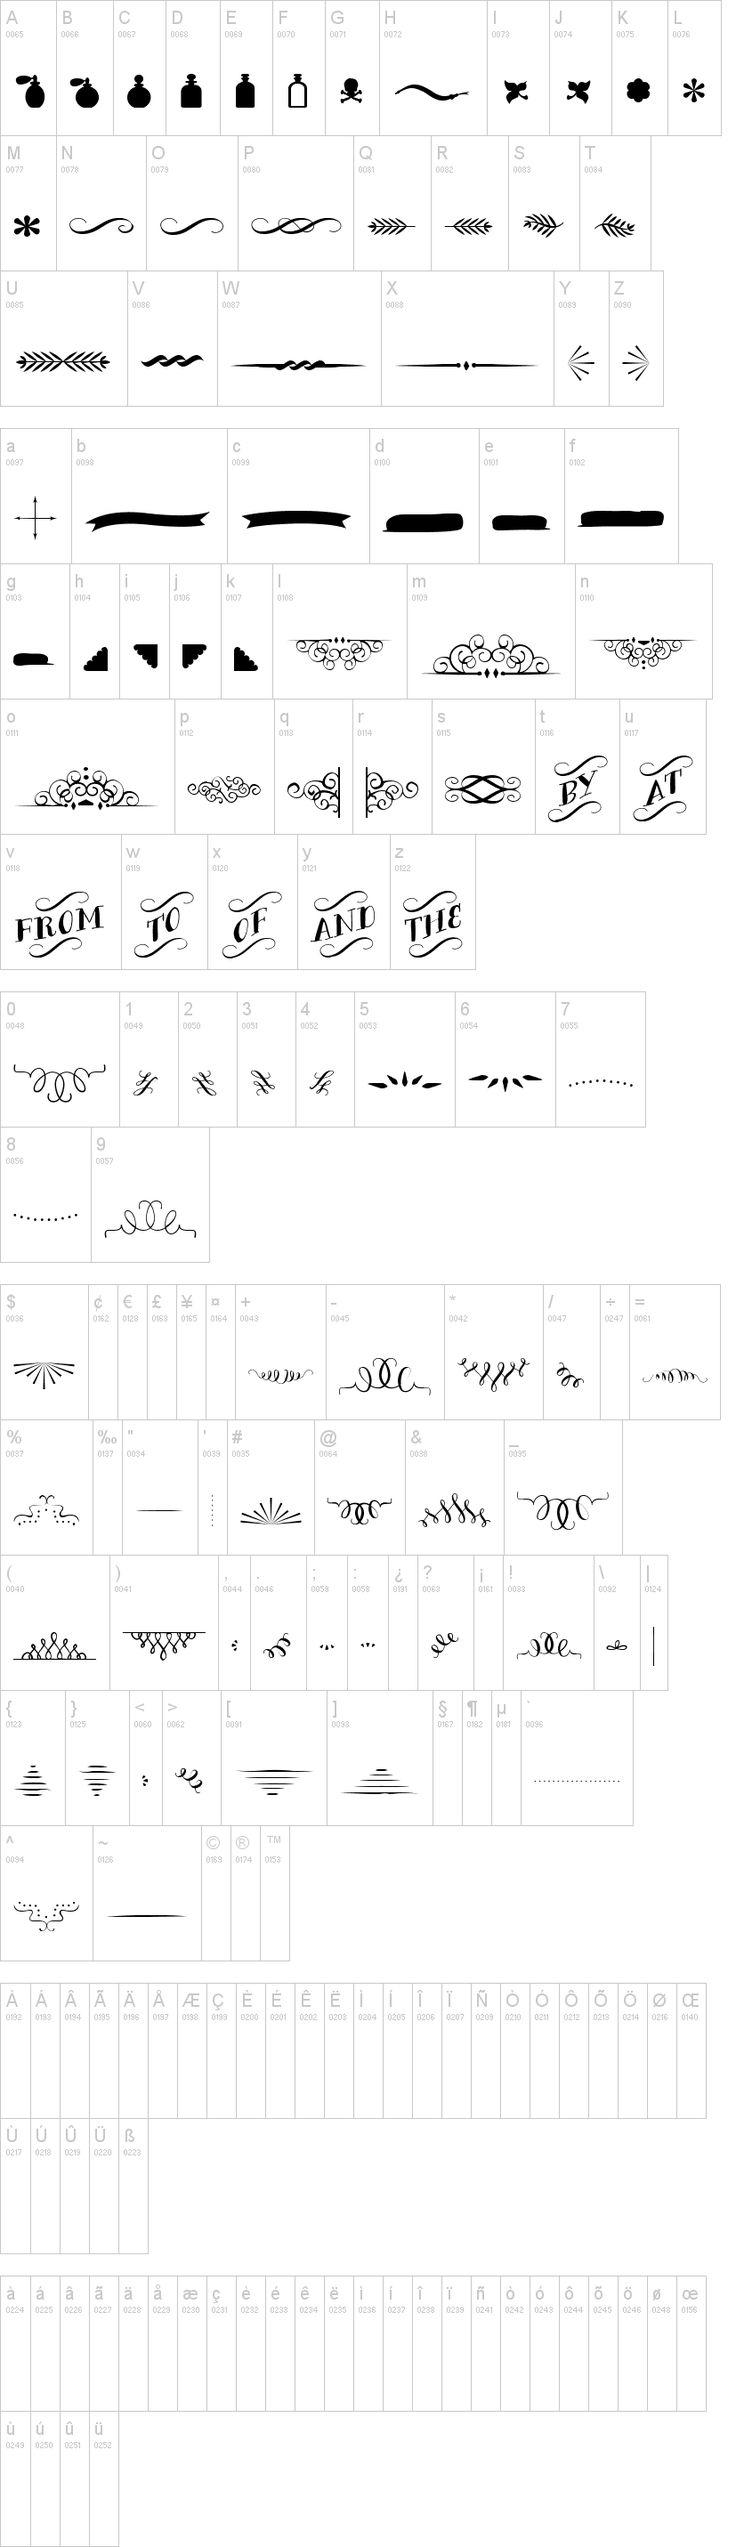 Bergamot Ornaments Font | dafont.com - classic scrolls with a vintage feel.